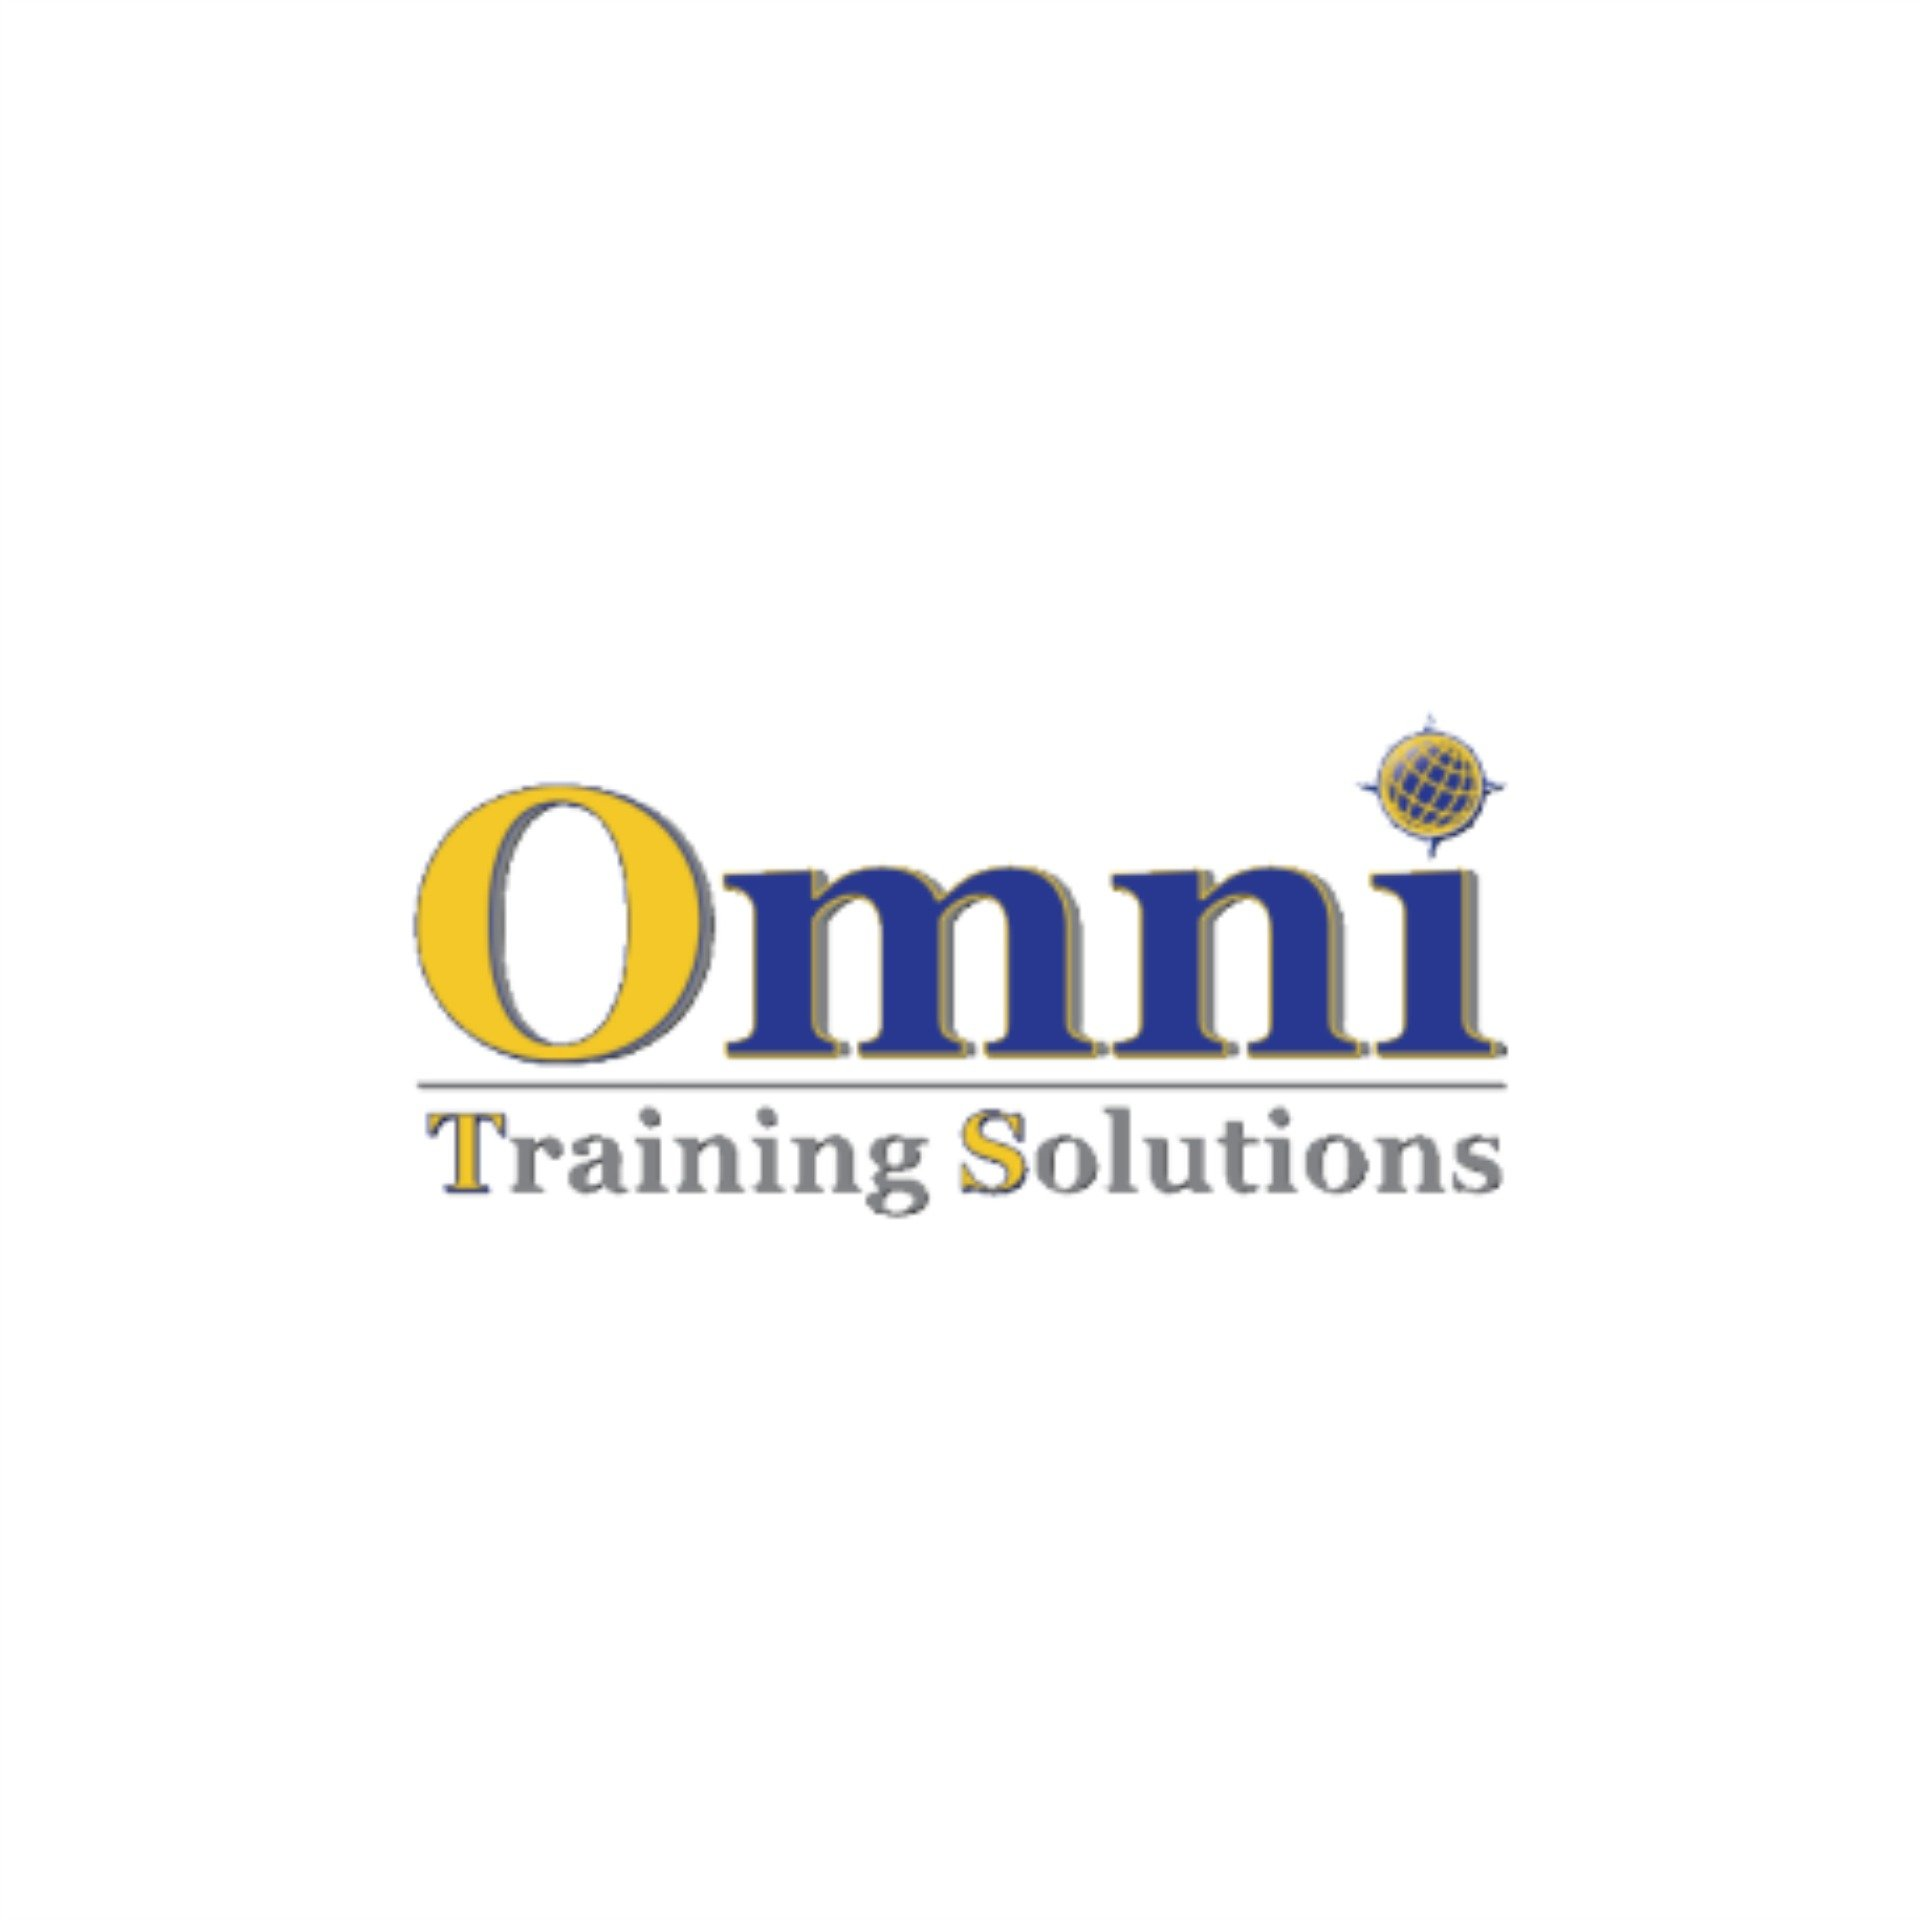 Omni Training Solutions